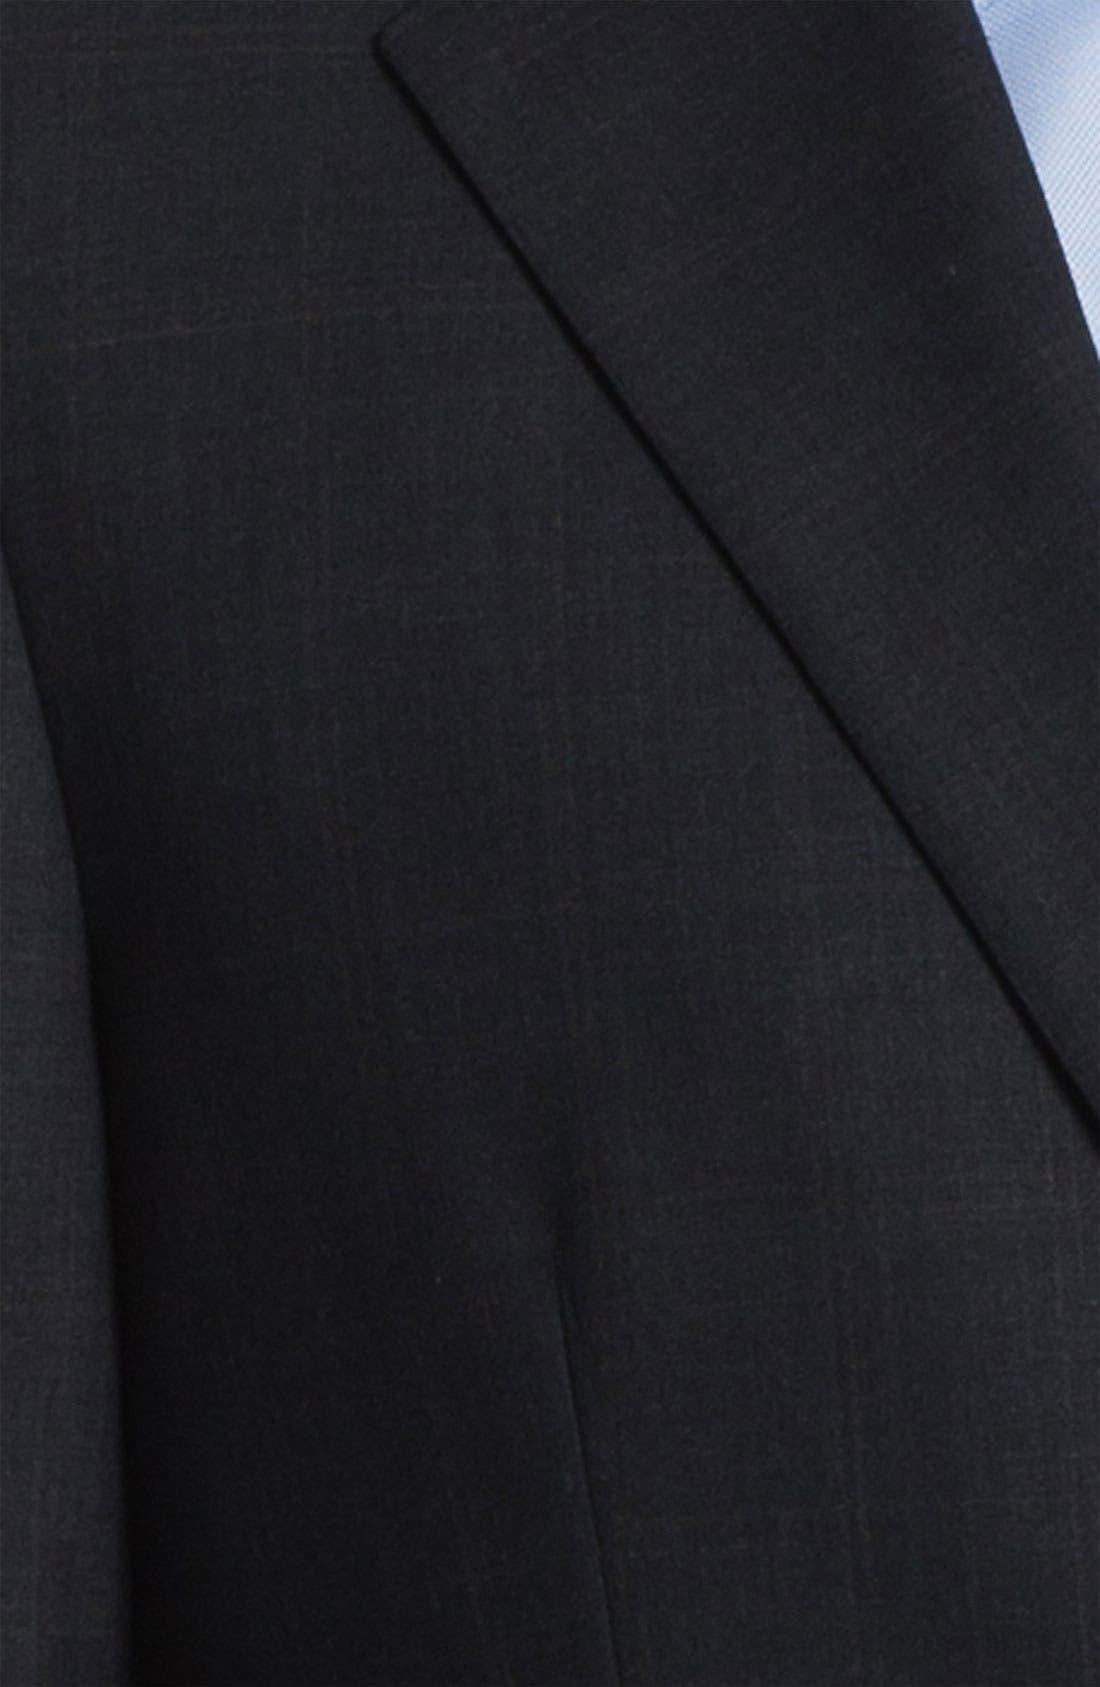 Alternate Image 2  - Joseph Abboud Windowpane Wool Suit